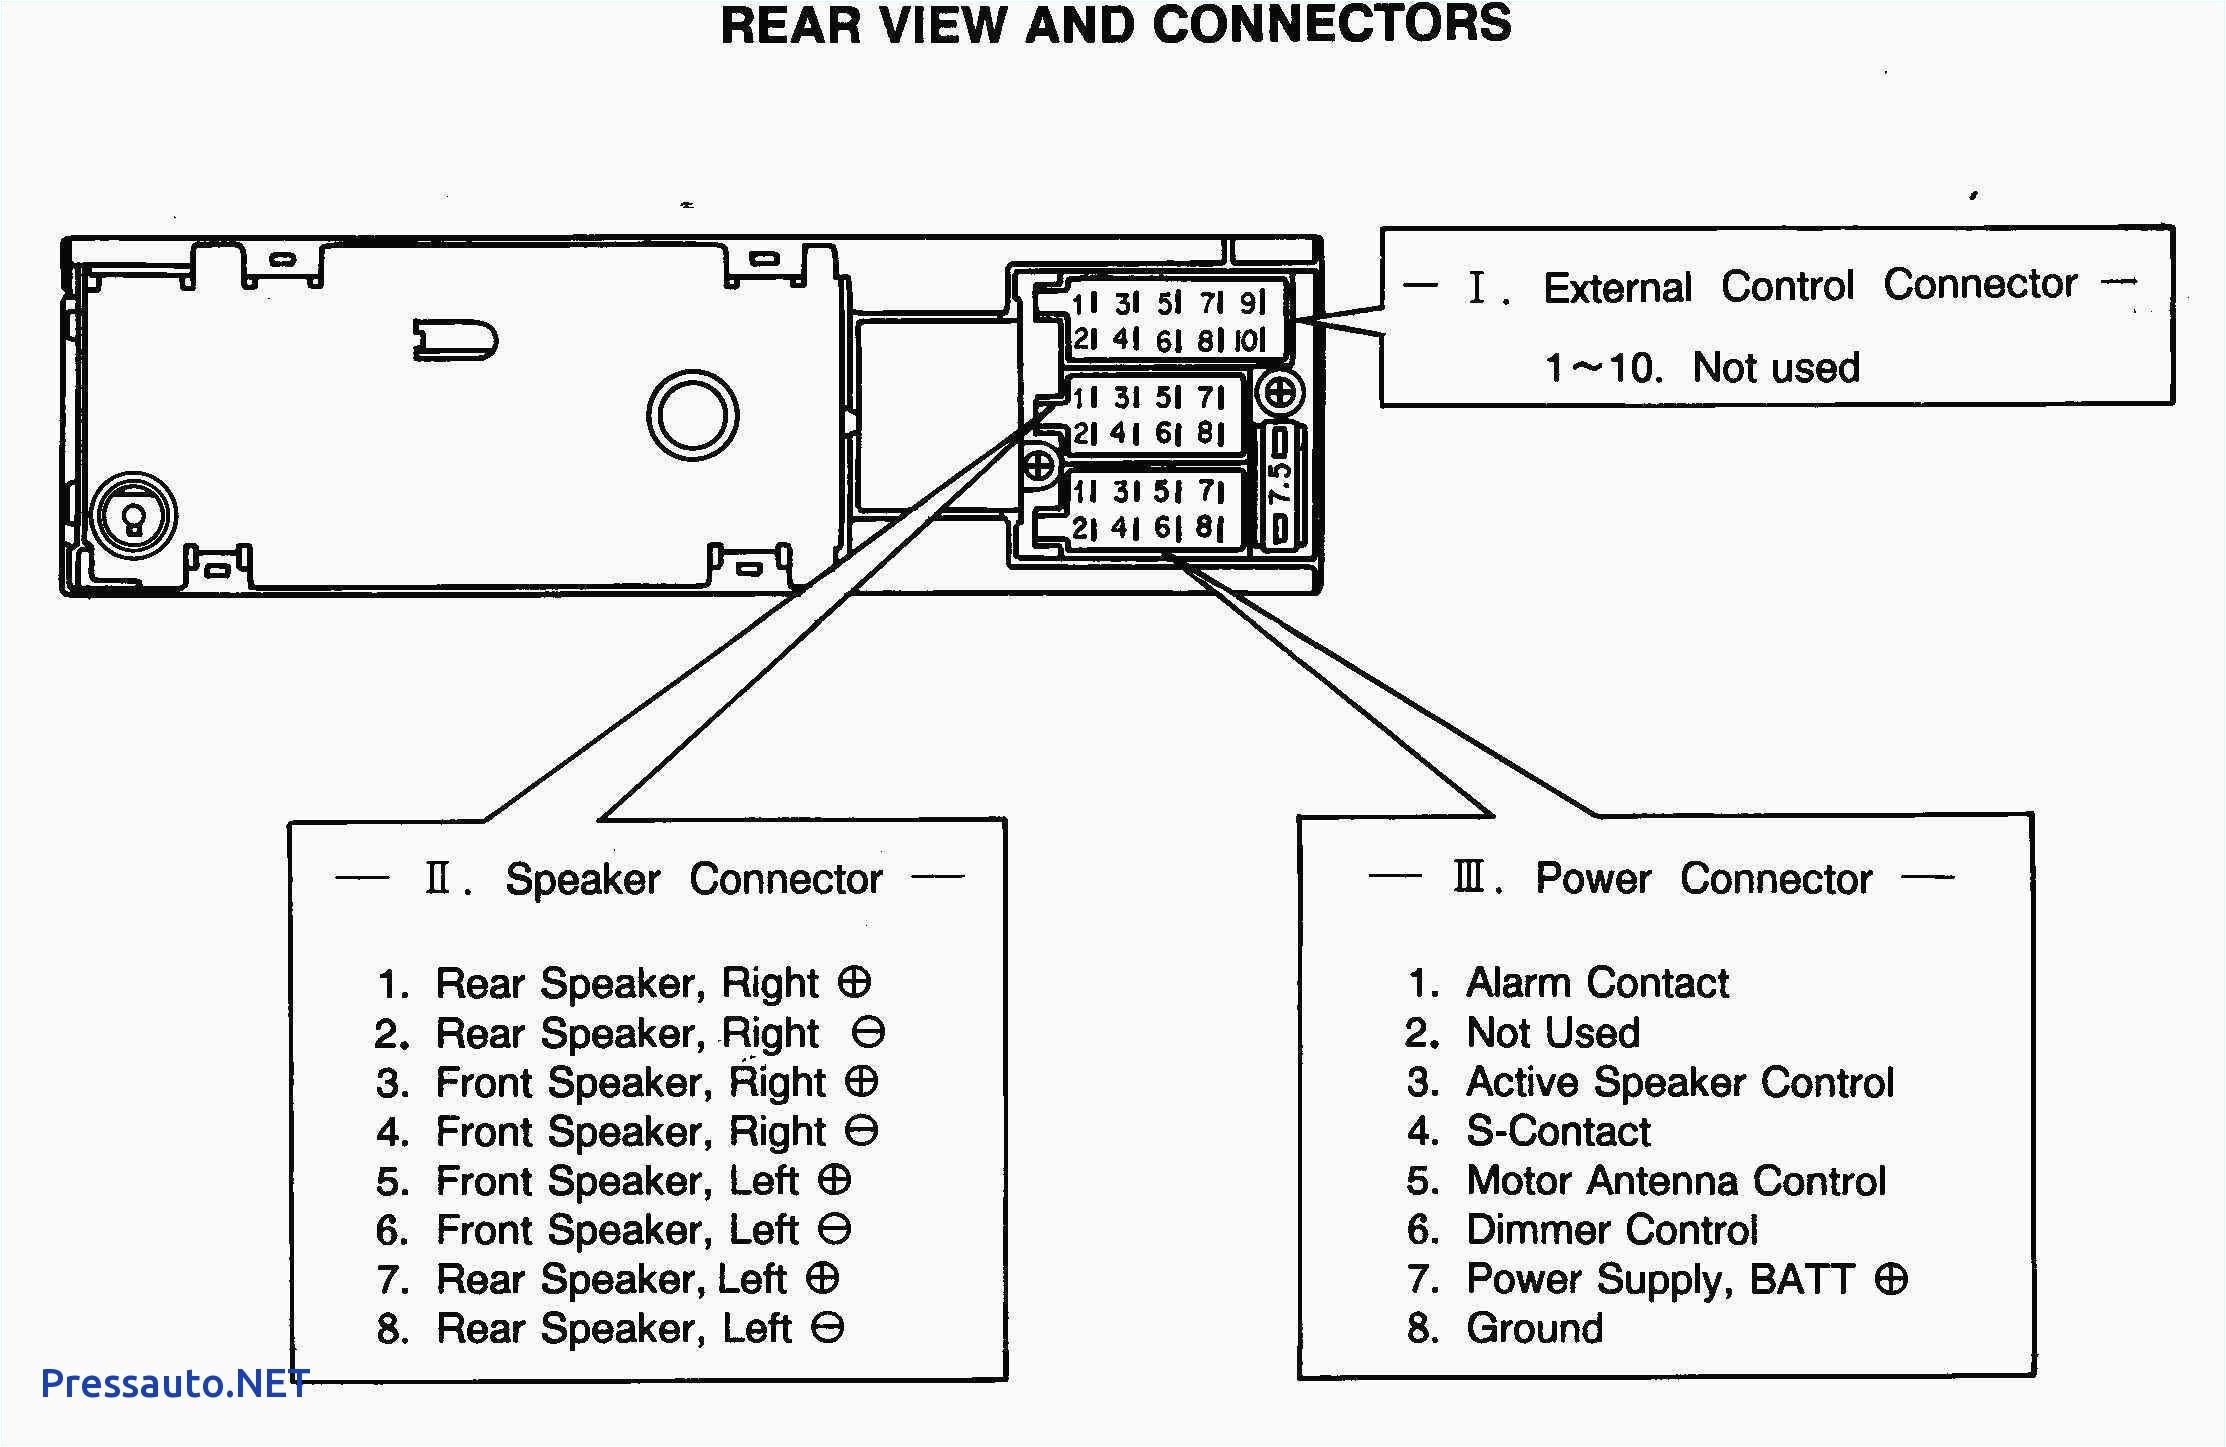 vauxhall ac wiring diagrams wiring diagram tags vauxhall coil pack wiring diagram vauxhall ac wiring diagram